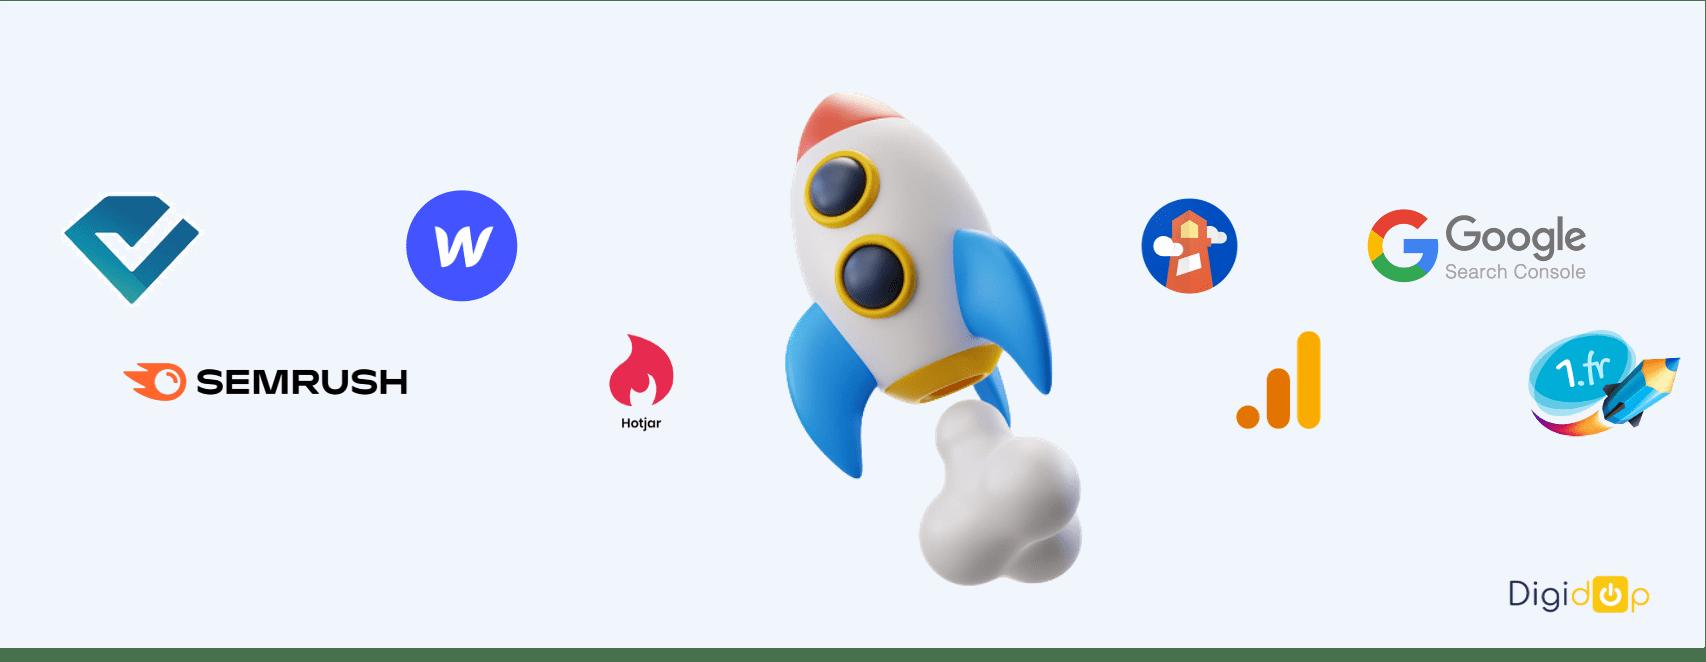 outils seo 2021 : semrush, analytics, webflow, lighthouse